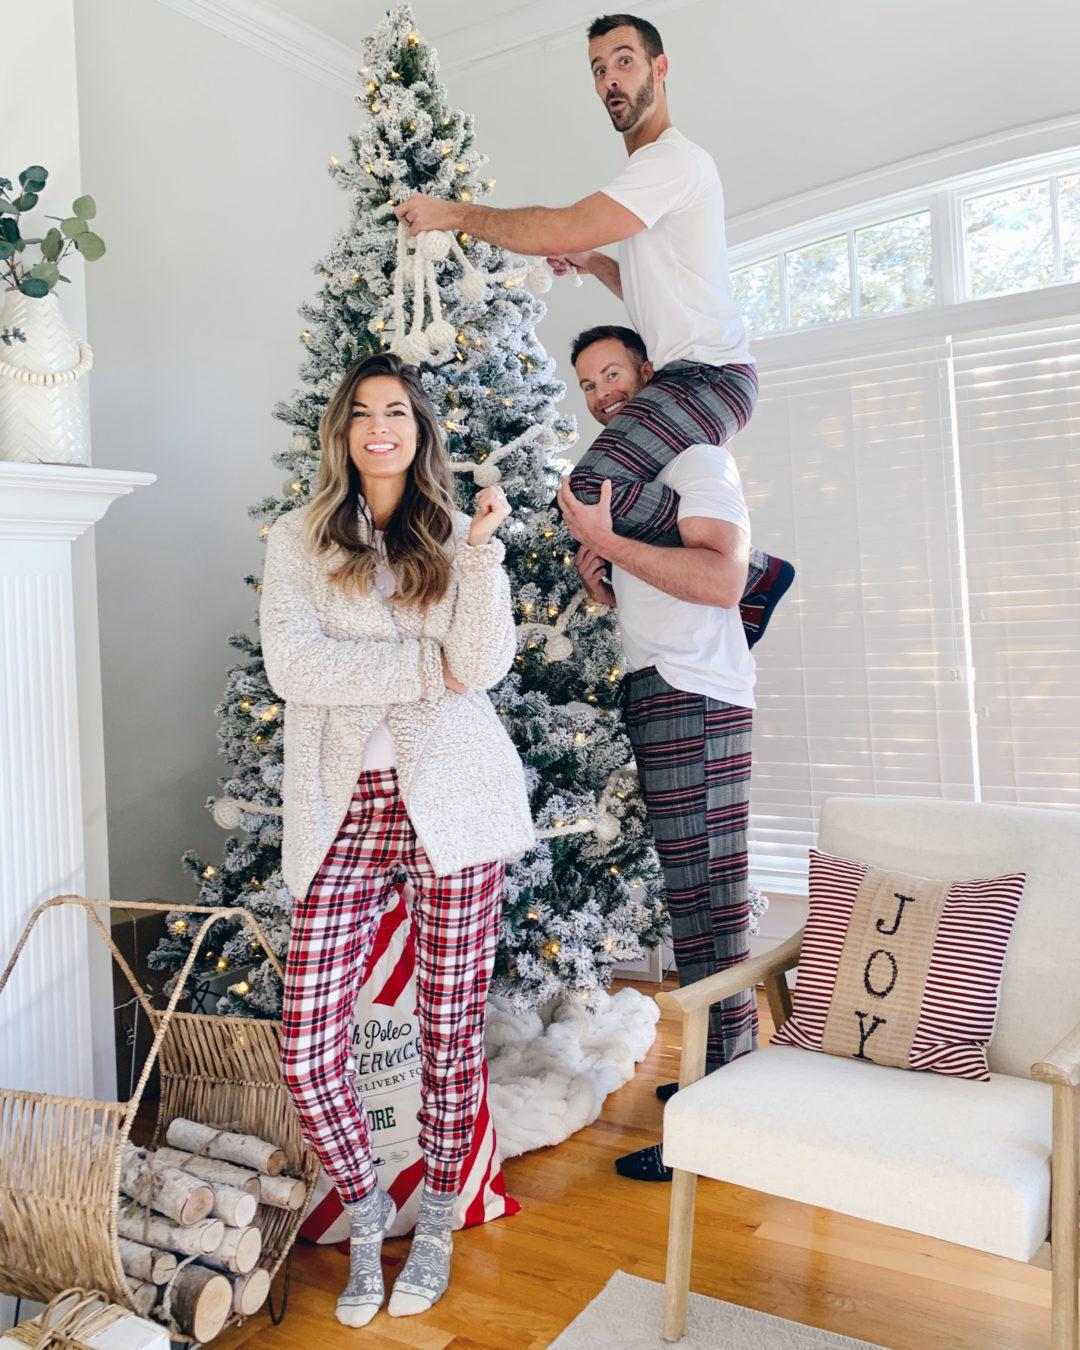 christmas pajamas for tall men and women - pinteresting plans fashion blog